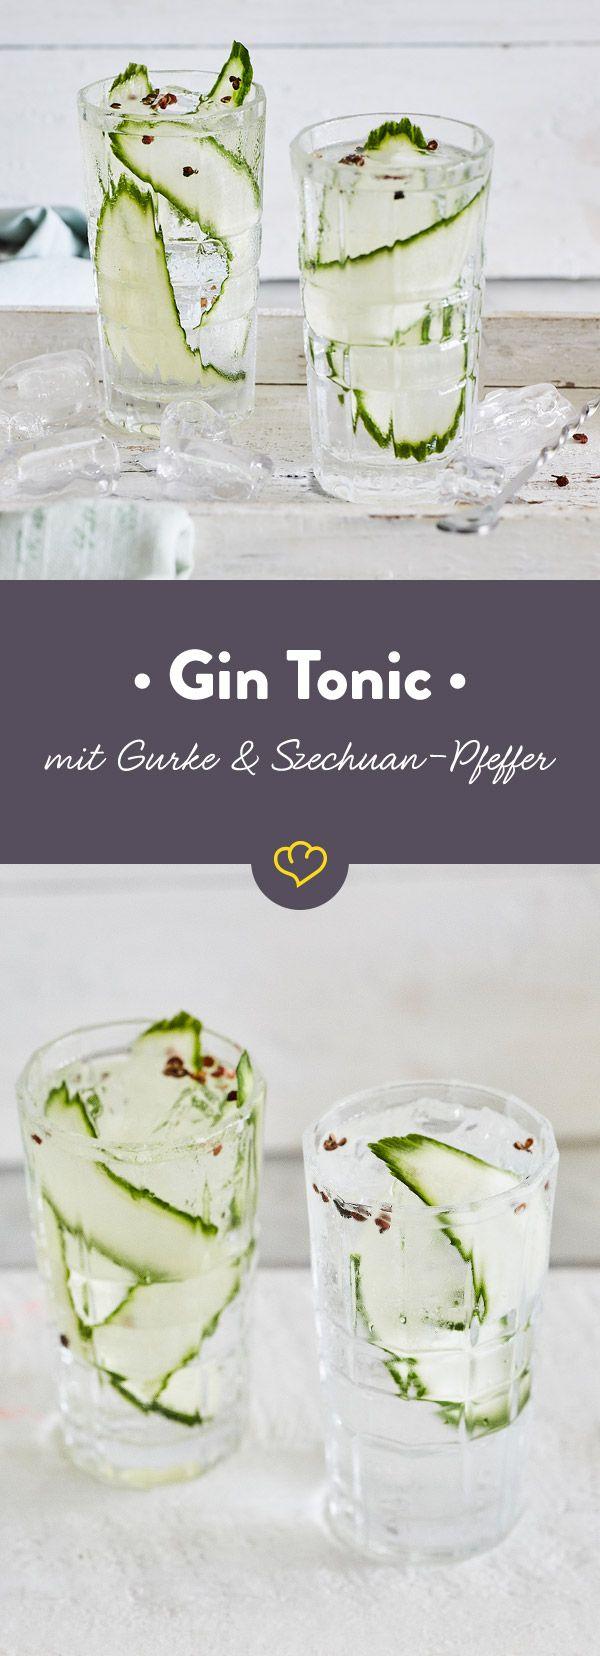 gin tonic mit gurke und szechuan pfeffer rezept party. Black Bedroom Furniture Sets. Home Design Ideas